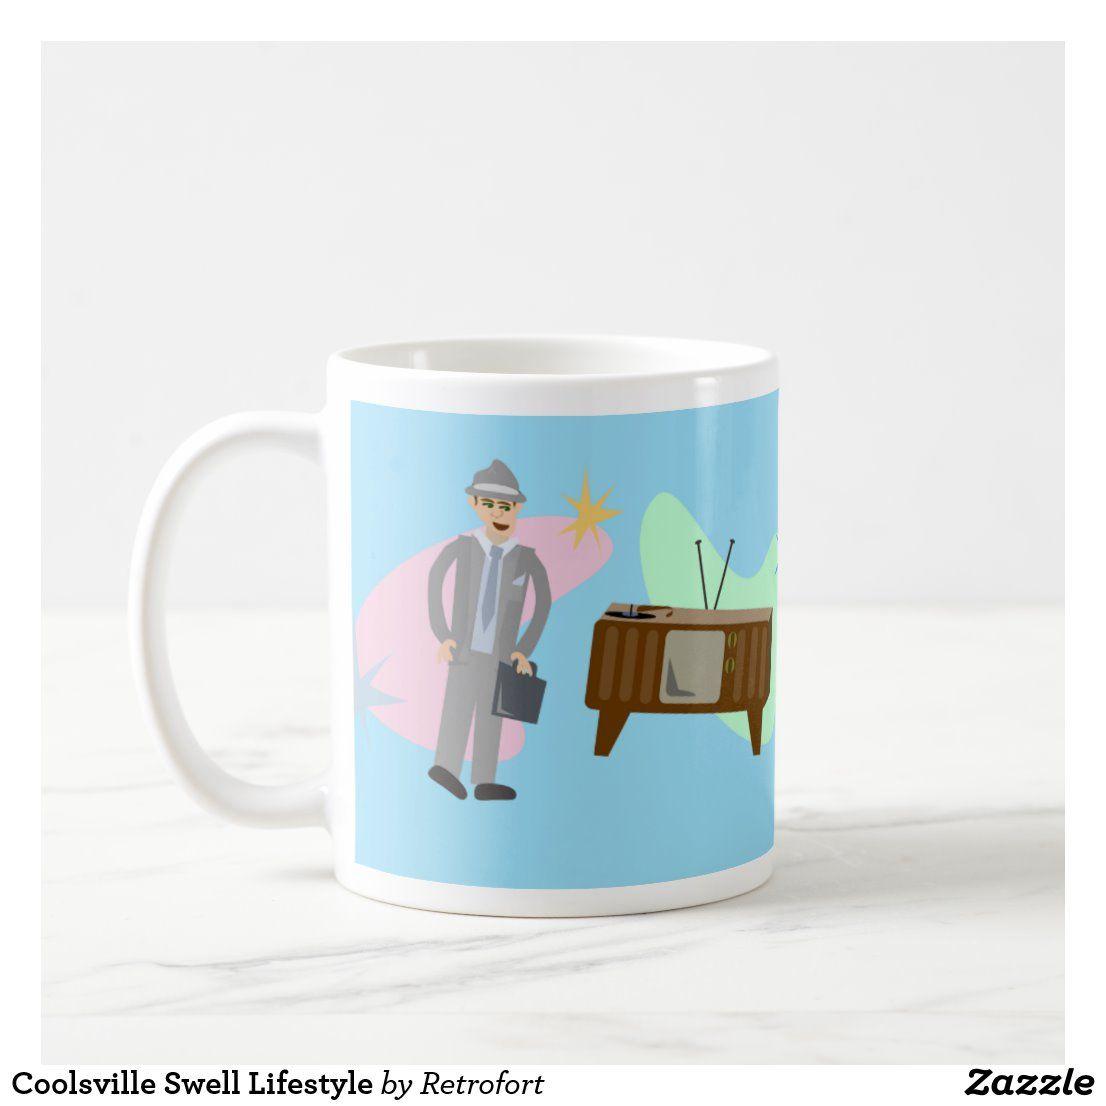 Coolsville swell lifestyle coffee mug mugs mugs for men